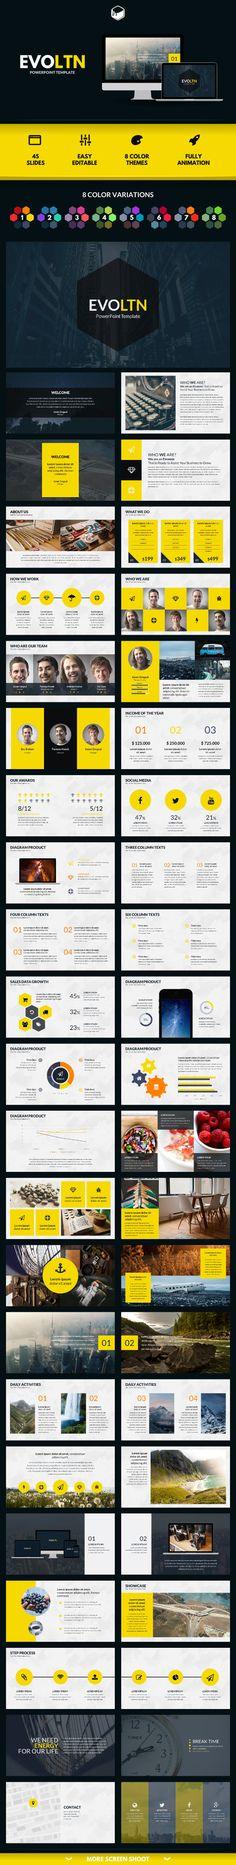 PowerPoint Template #design Download: http://graphicriver.net/item/evoltn-powerpoint-template/11823375?ref=ksioks